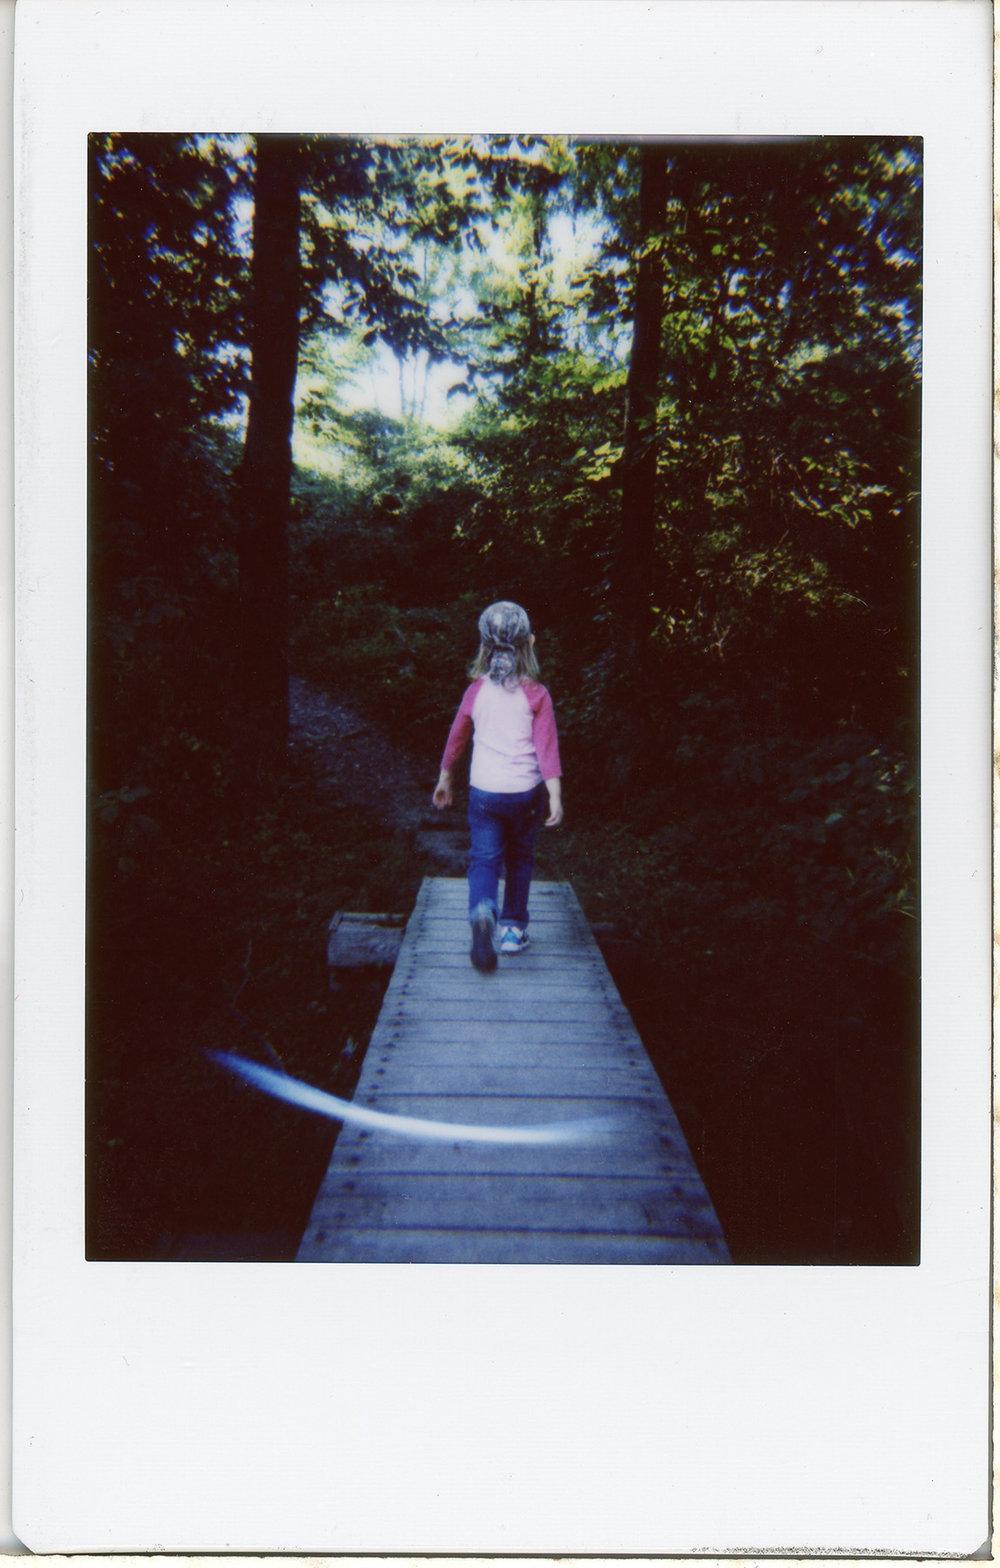 Childhood is Magic | Lomo Instant Automat | Paige Durborow